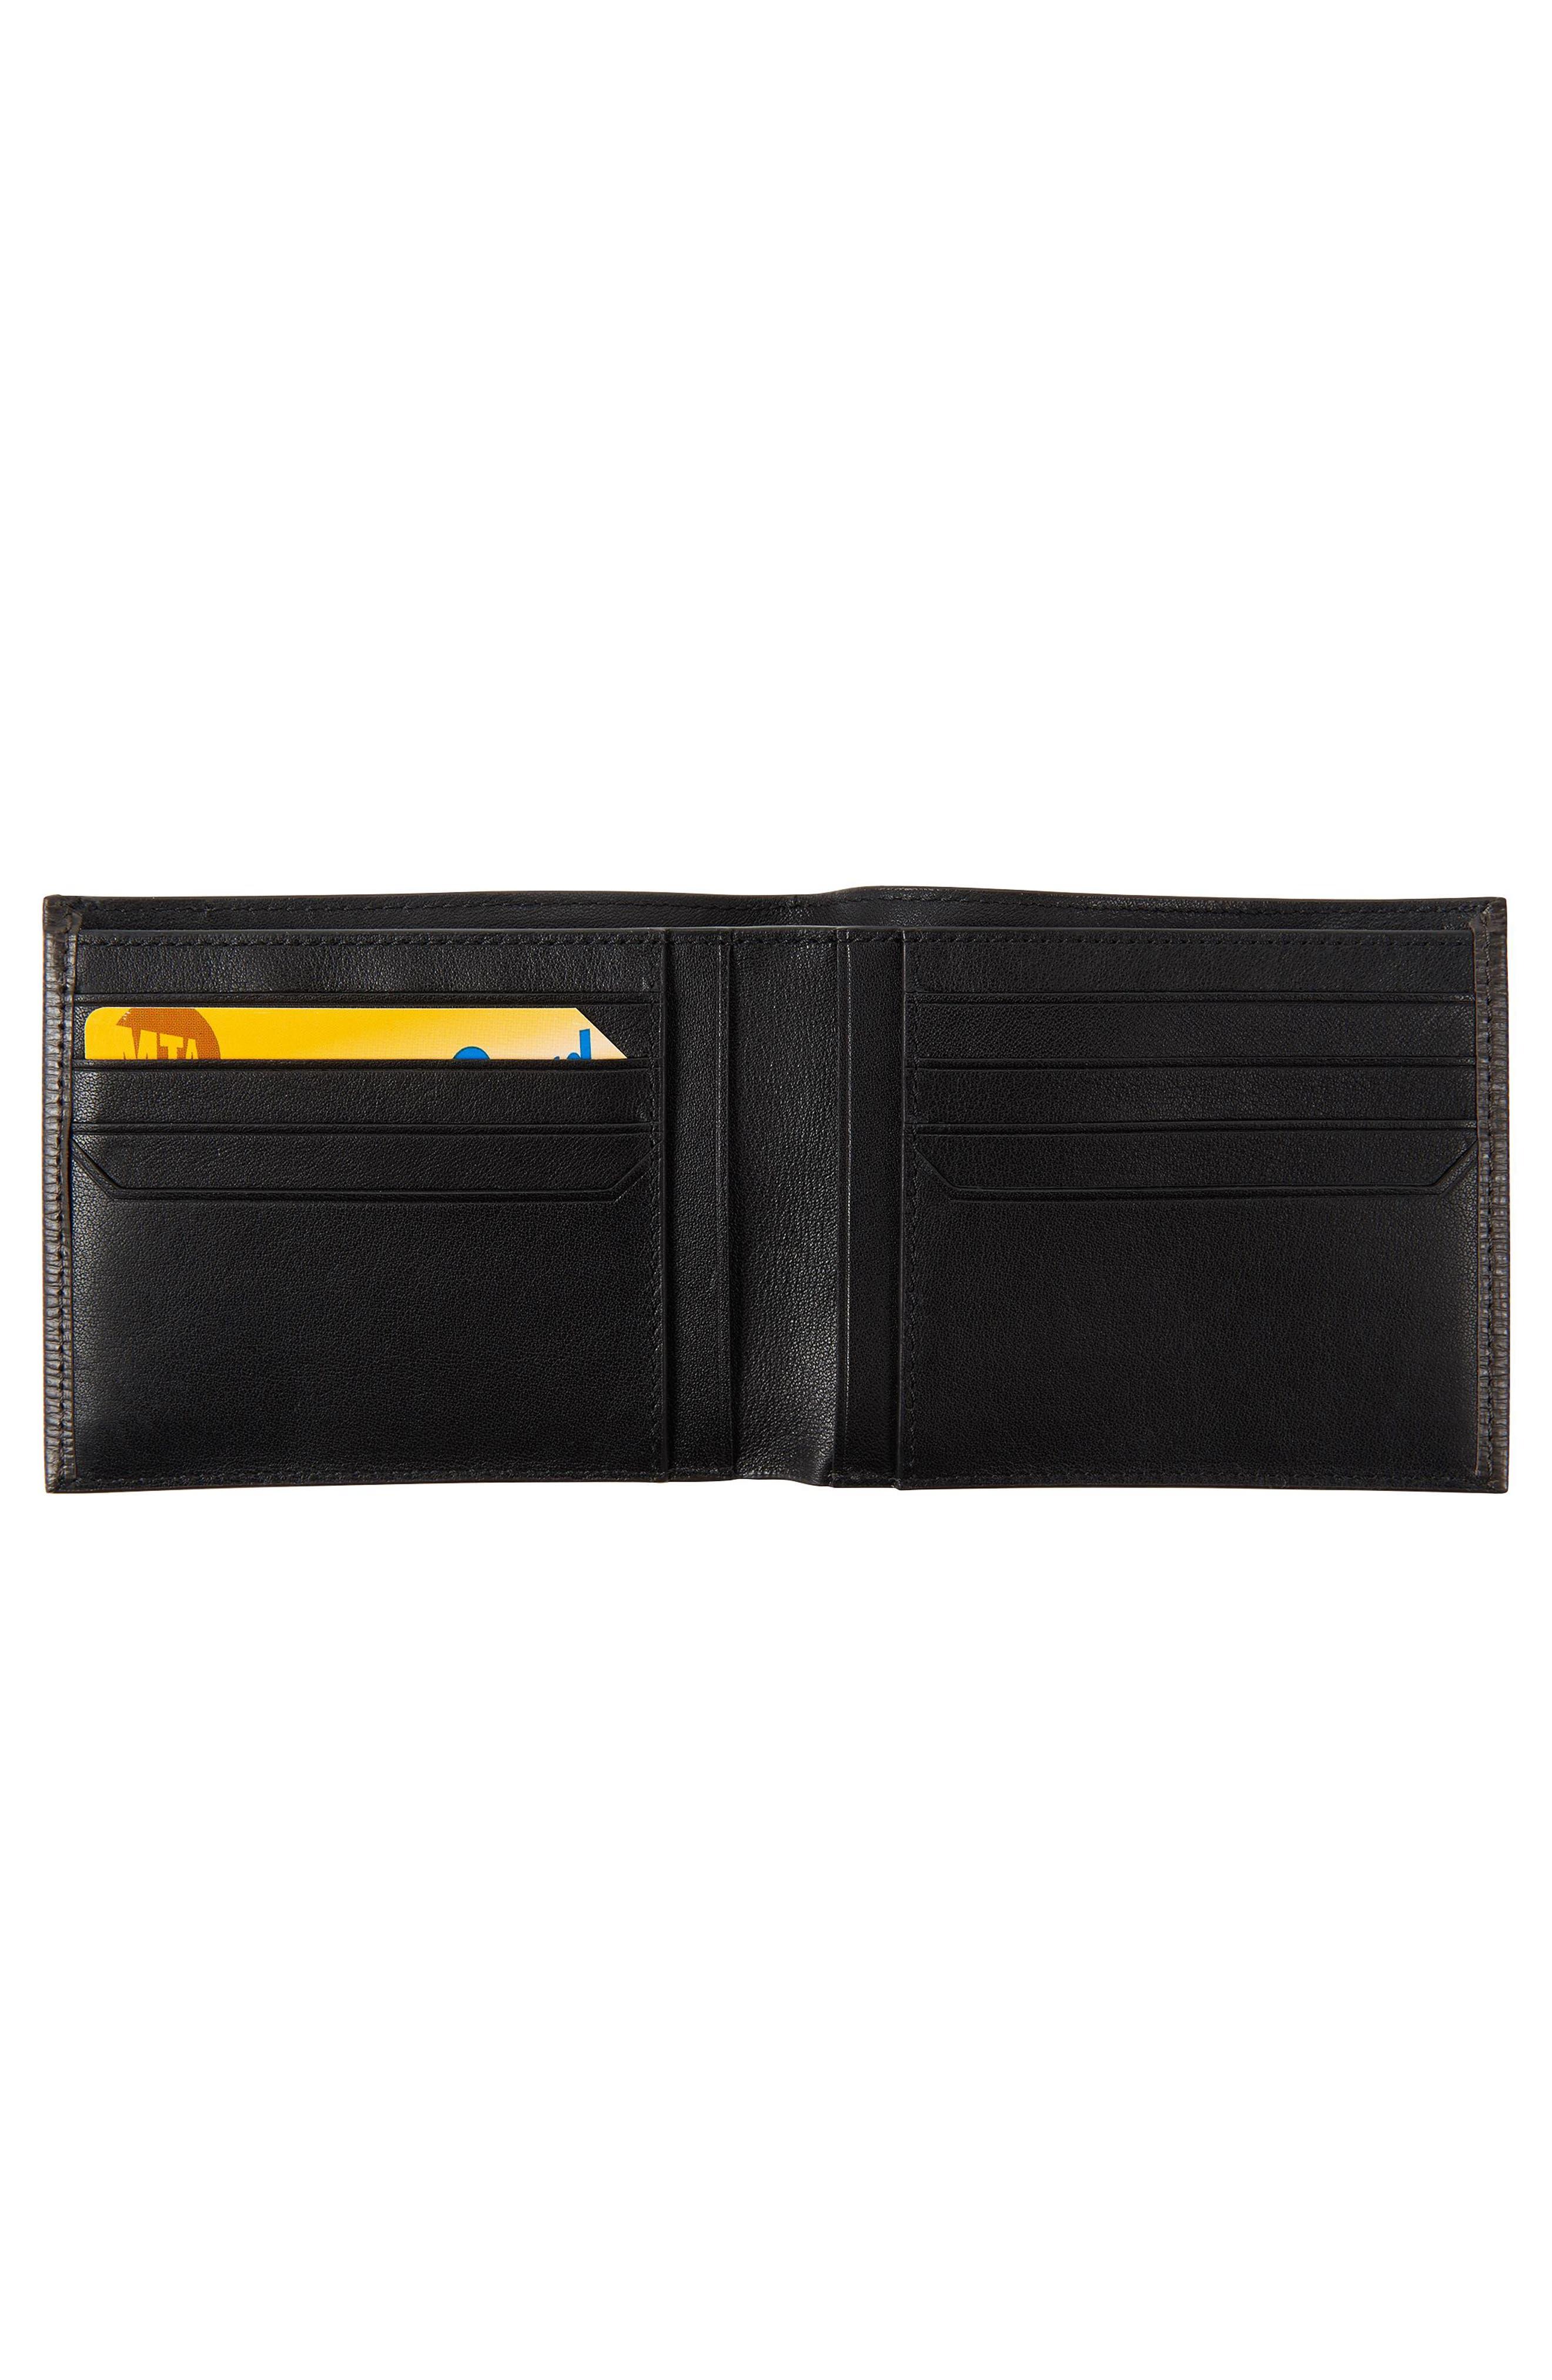 Monaco Leather Wallet,                             Alternate thumbnail 2, color,